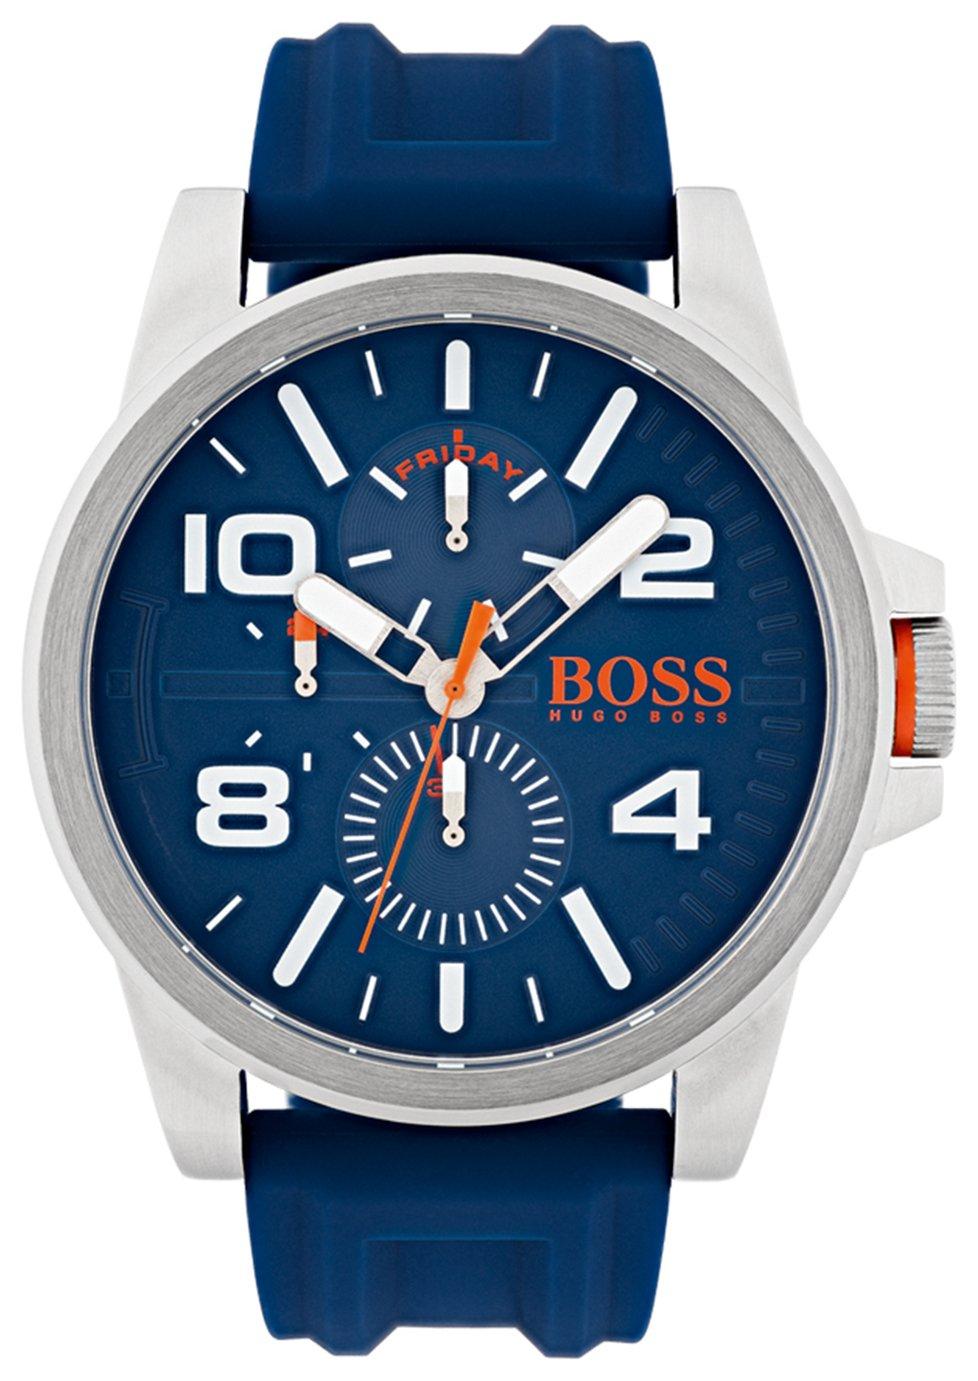 Boss Orange Blue Silicone Strap Watch